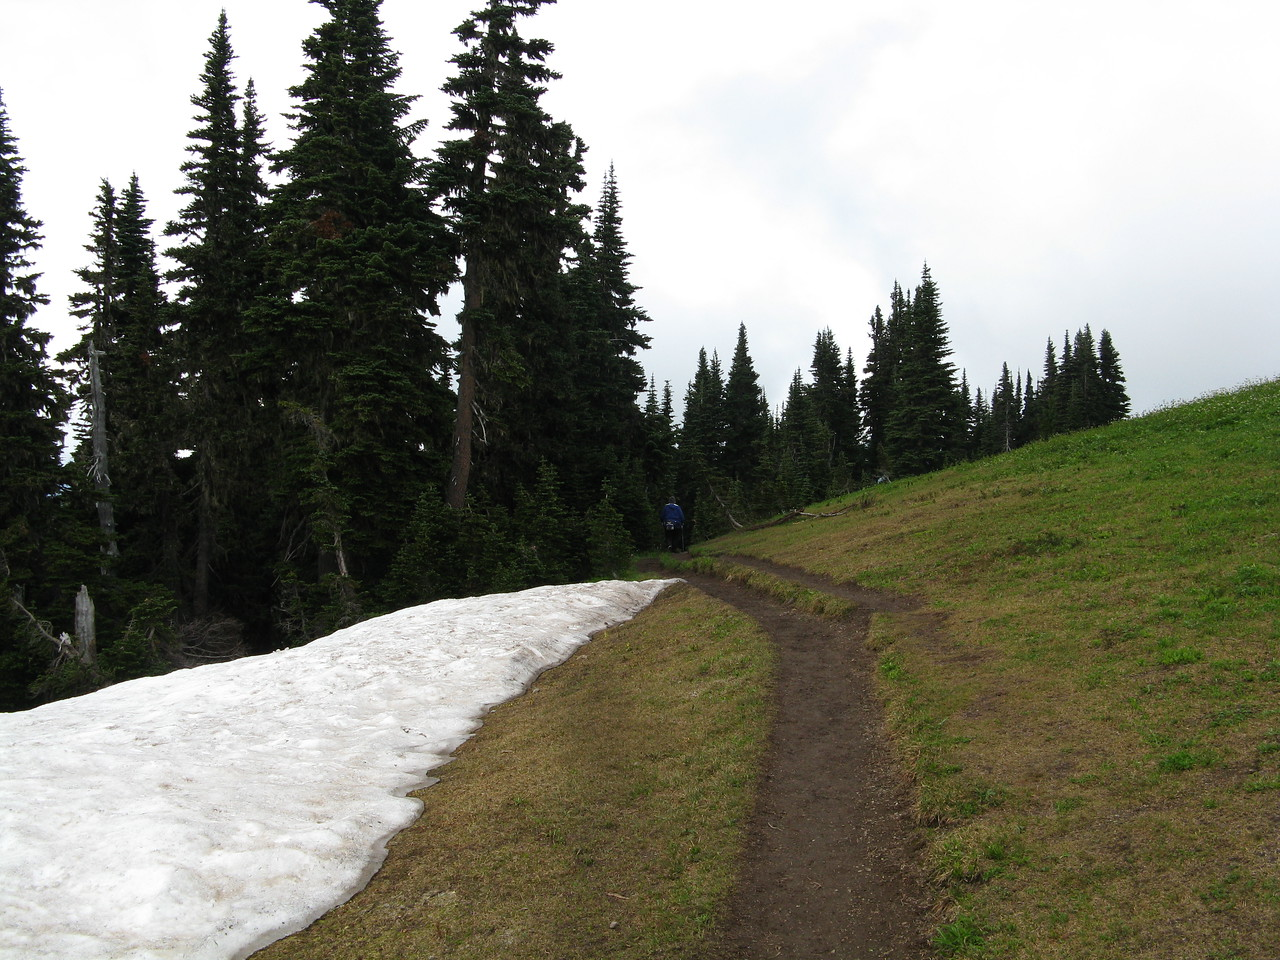 We headed back down the trail.